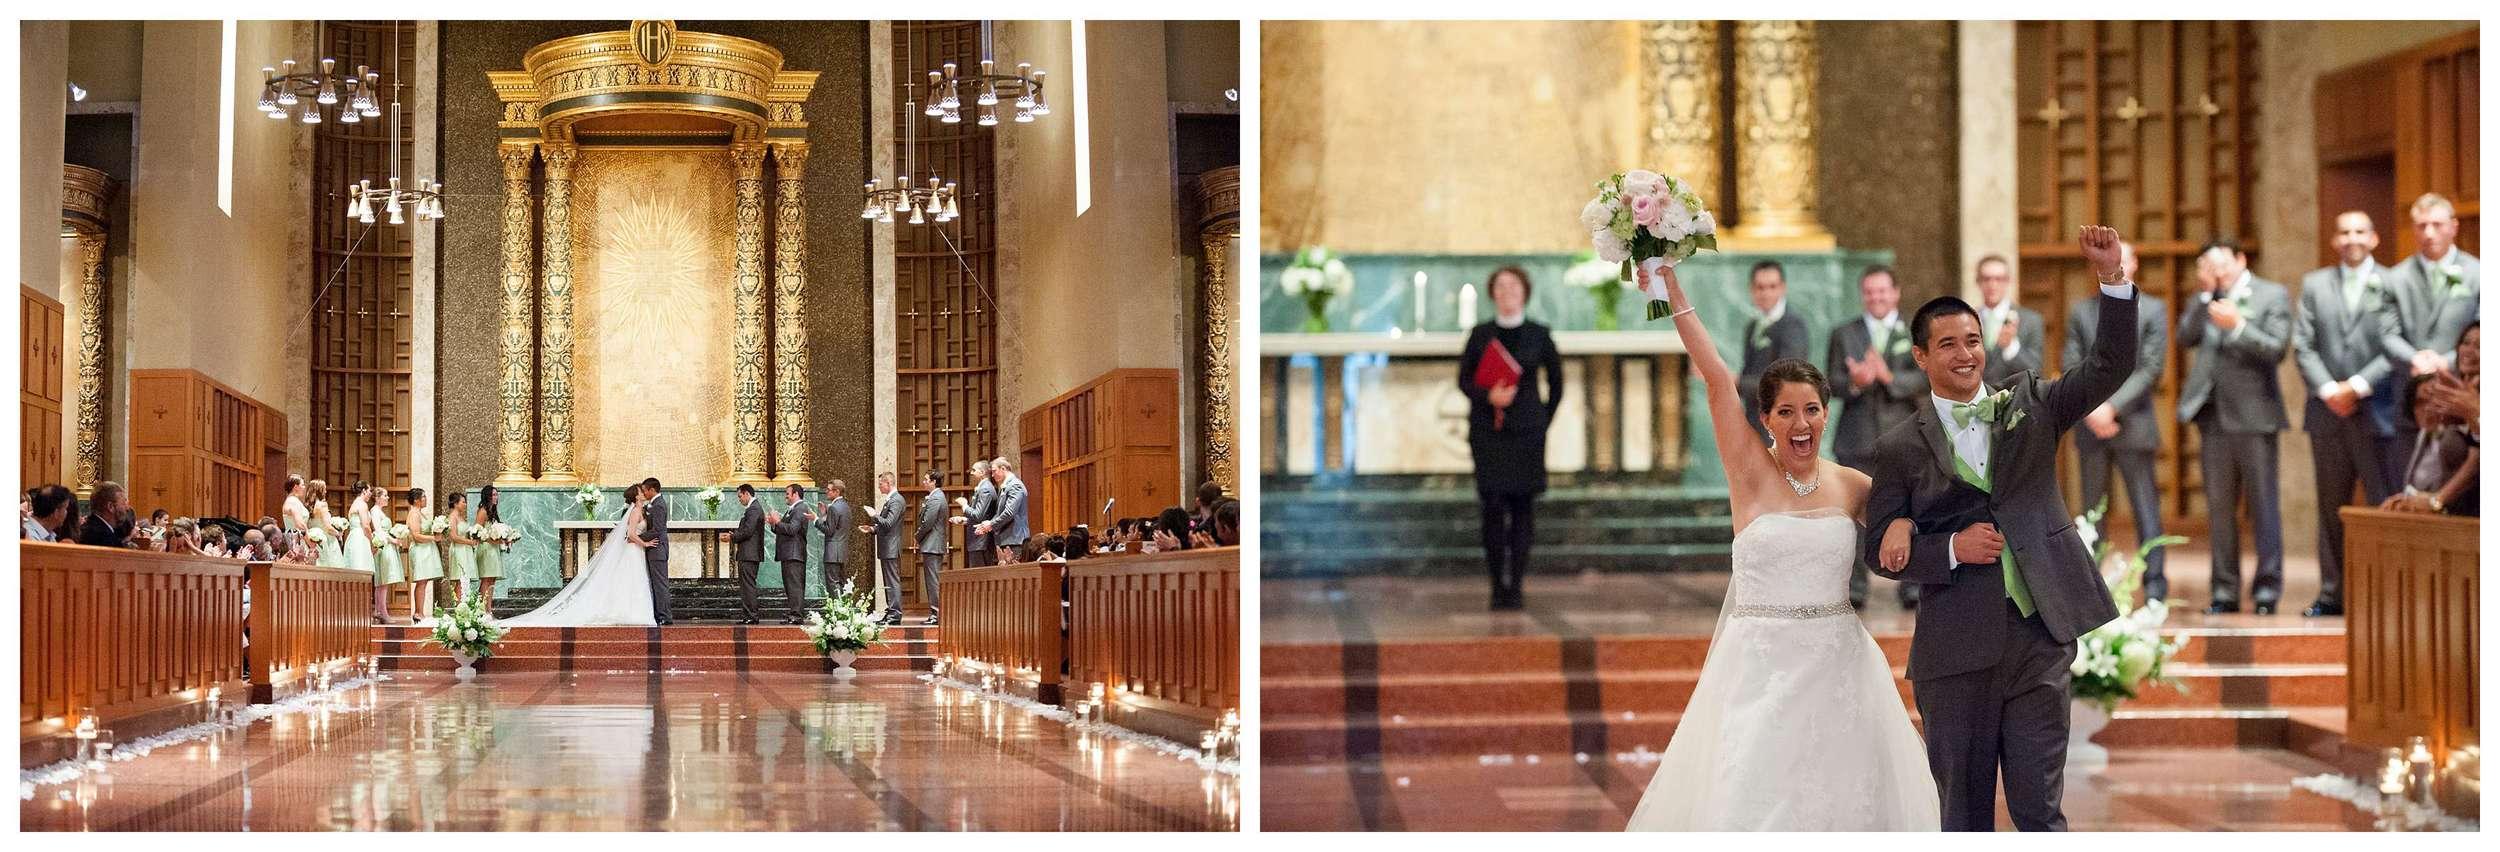 B-Jones-Photography-Seattle-Wedding-Photographer_0863.jpg